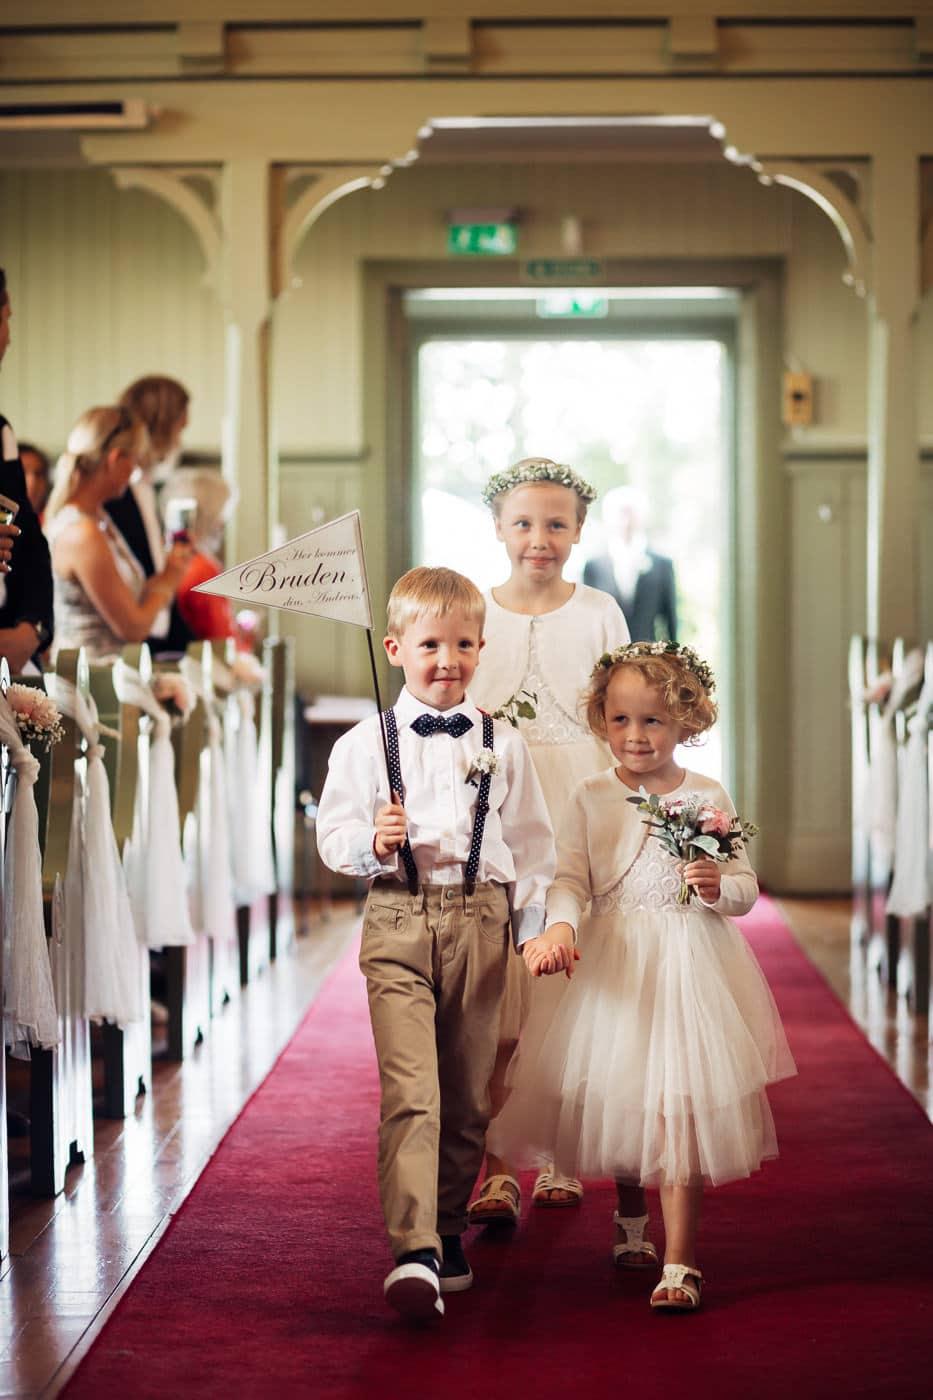 Karoline & Andreas - bryllup i Østfold med magiske detaljer Bryllup Fredrikstad Fotograf 20